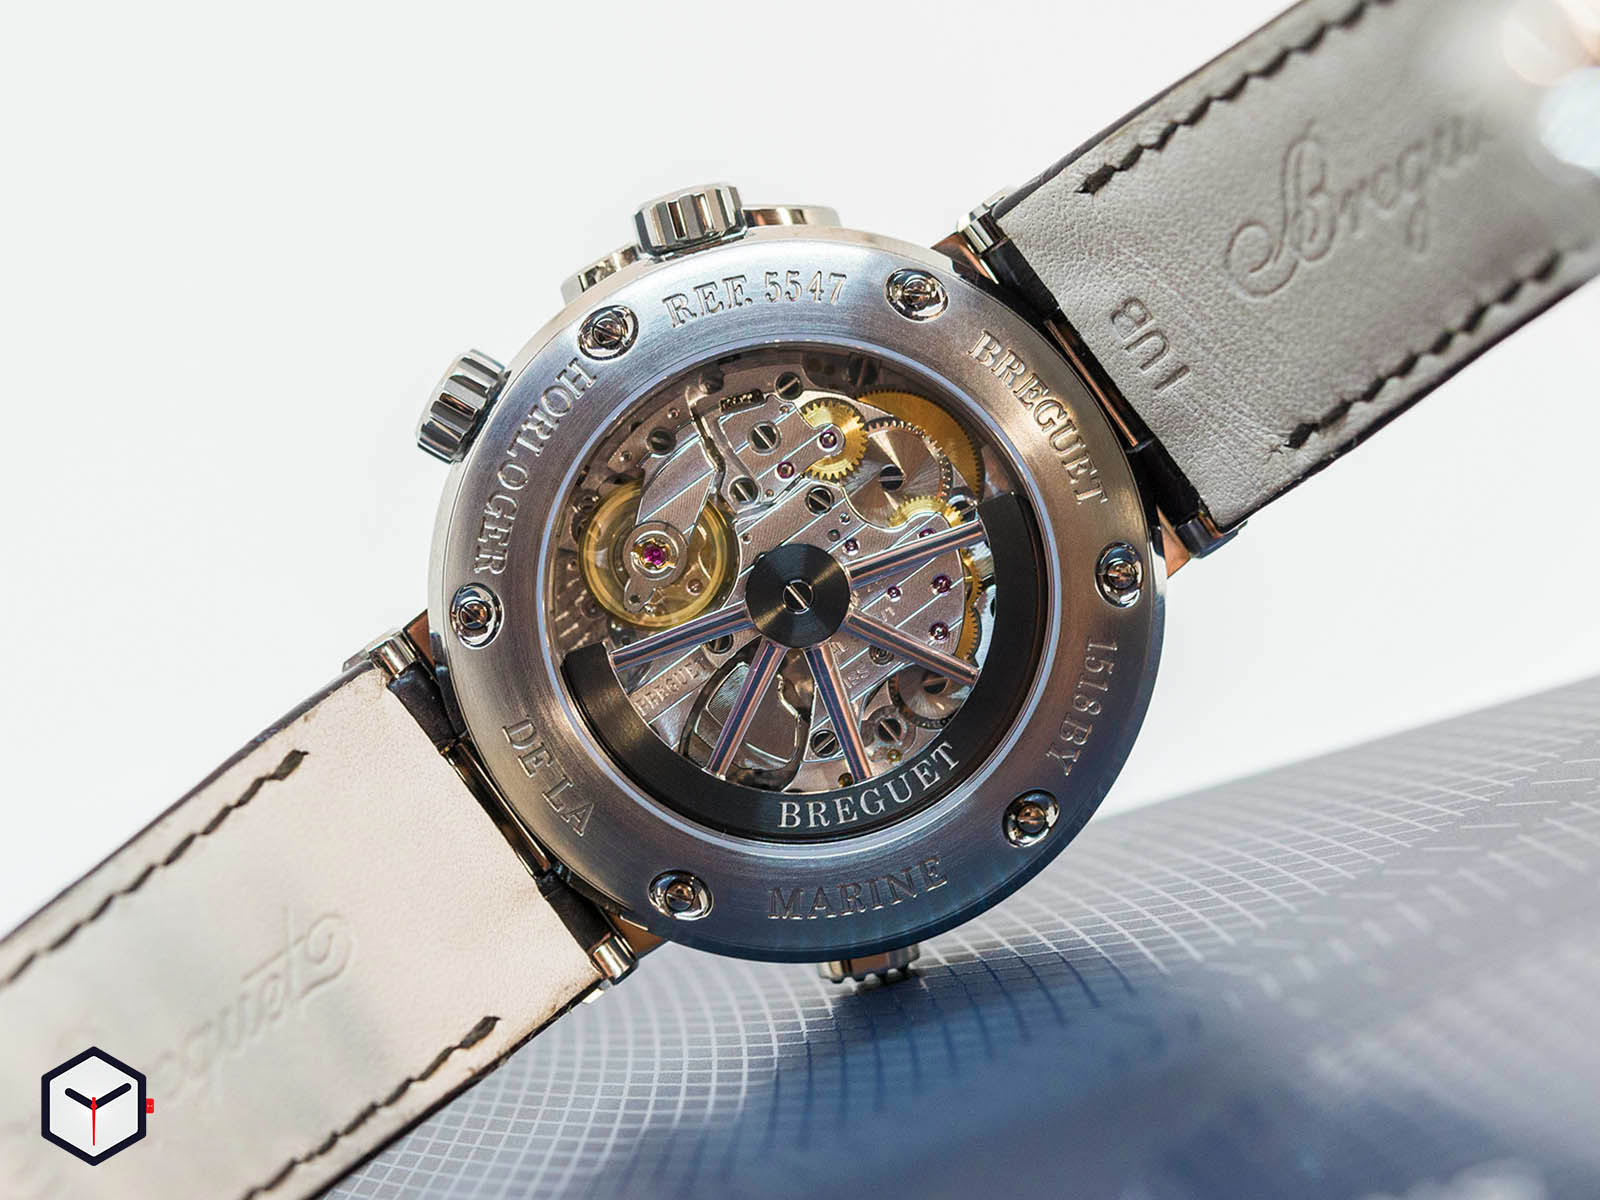 mechanical-alarm-watches-breguet-marine-alarme-musicale-3.jpg